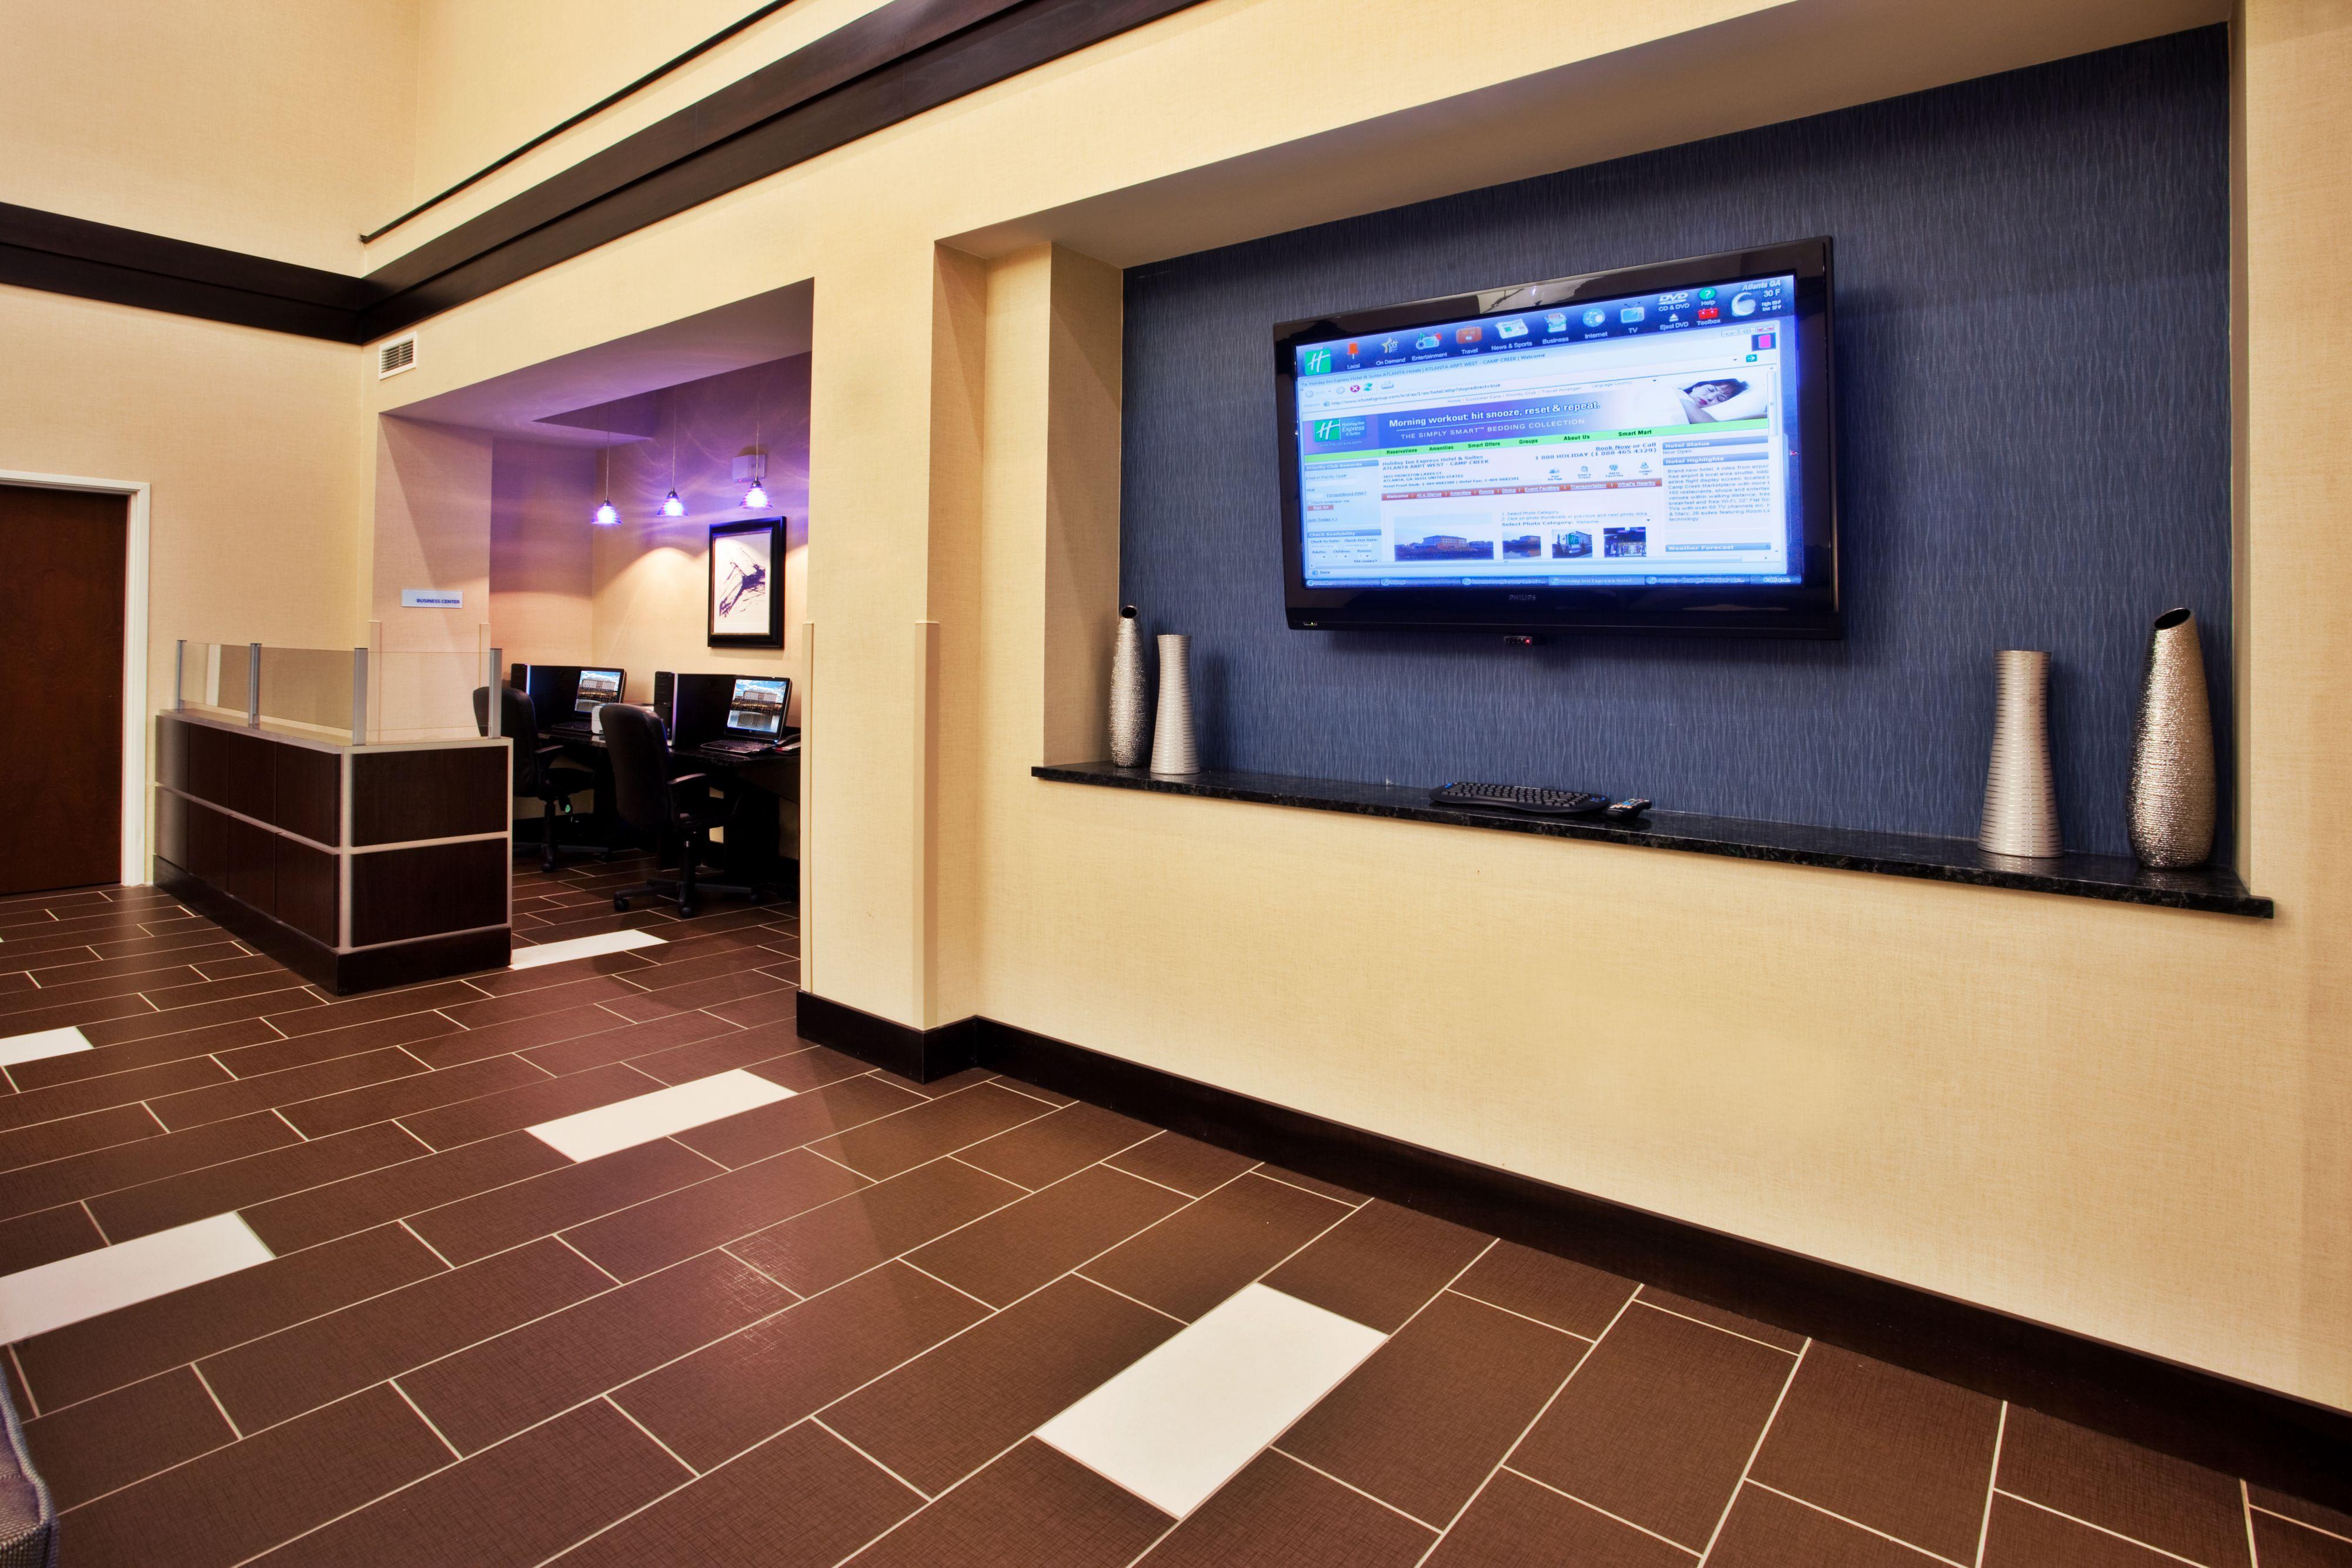 Holiday Inn Express & Suites Atlanta Arpt West - Camp Creek image 7